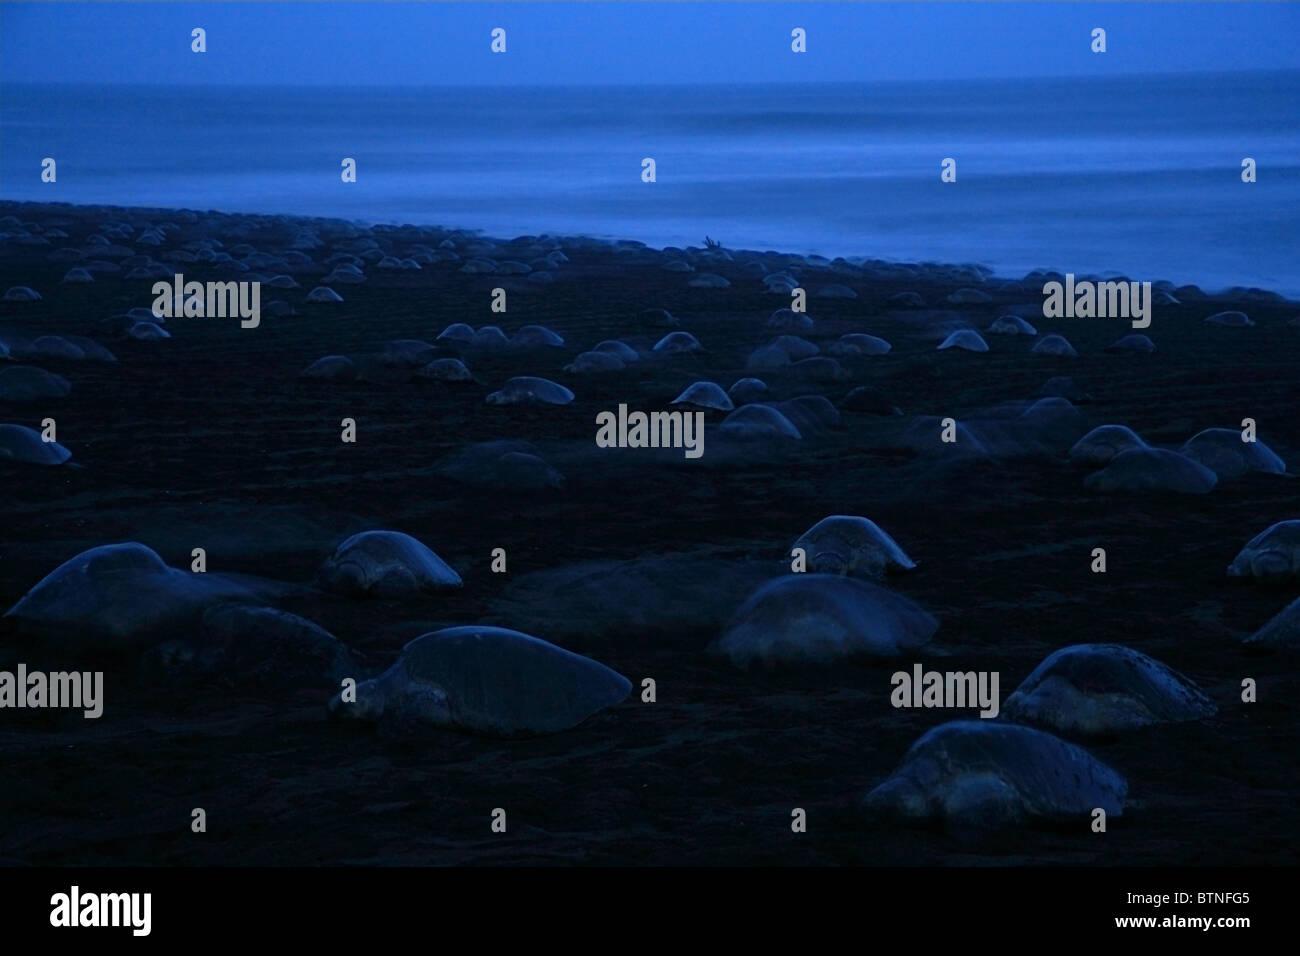 Arribada of Olive Ridley Turtles (Lepidochelys olivacea) return to ocean at dusk after nesting.  Playa Ostional, - Stock Image